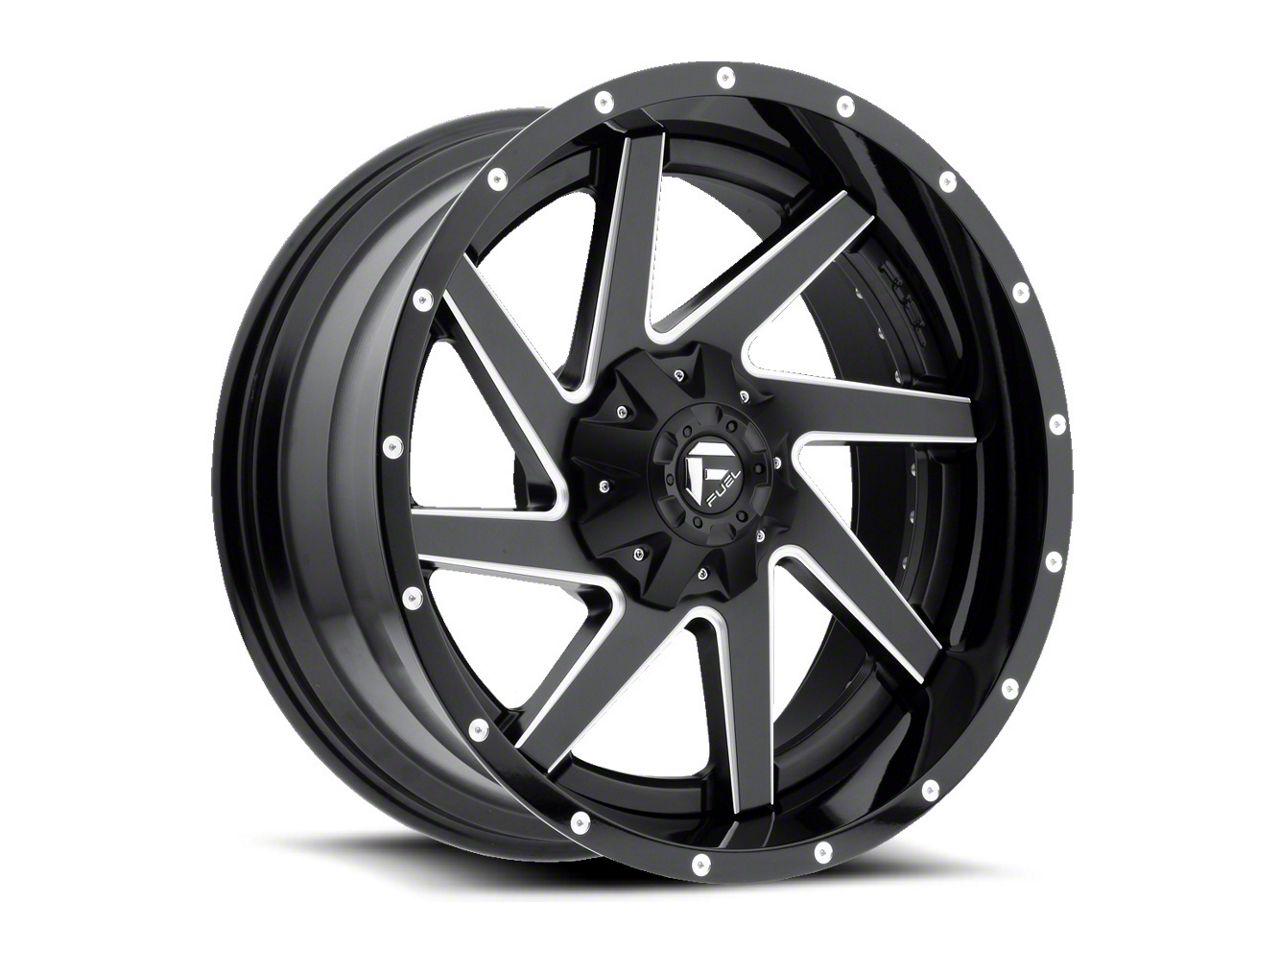 Fuel Wheels Renegade Black Milled 6-Lug Wheel - 20x10 (99-18 Silverado 1500)